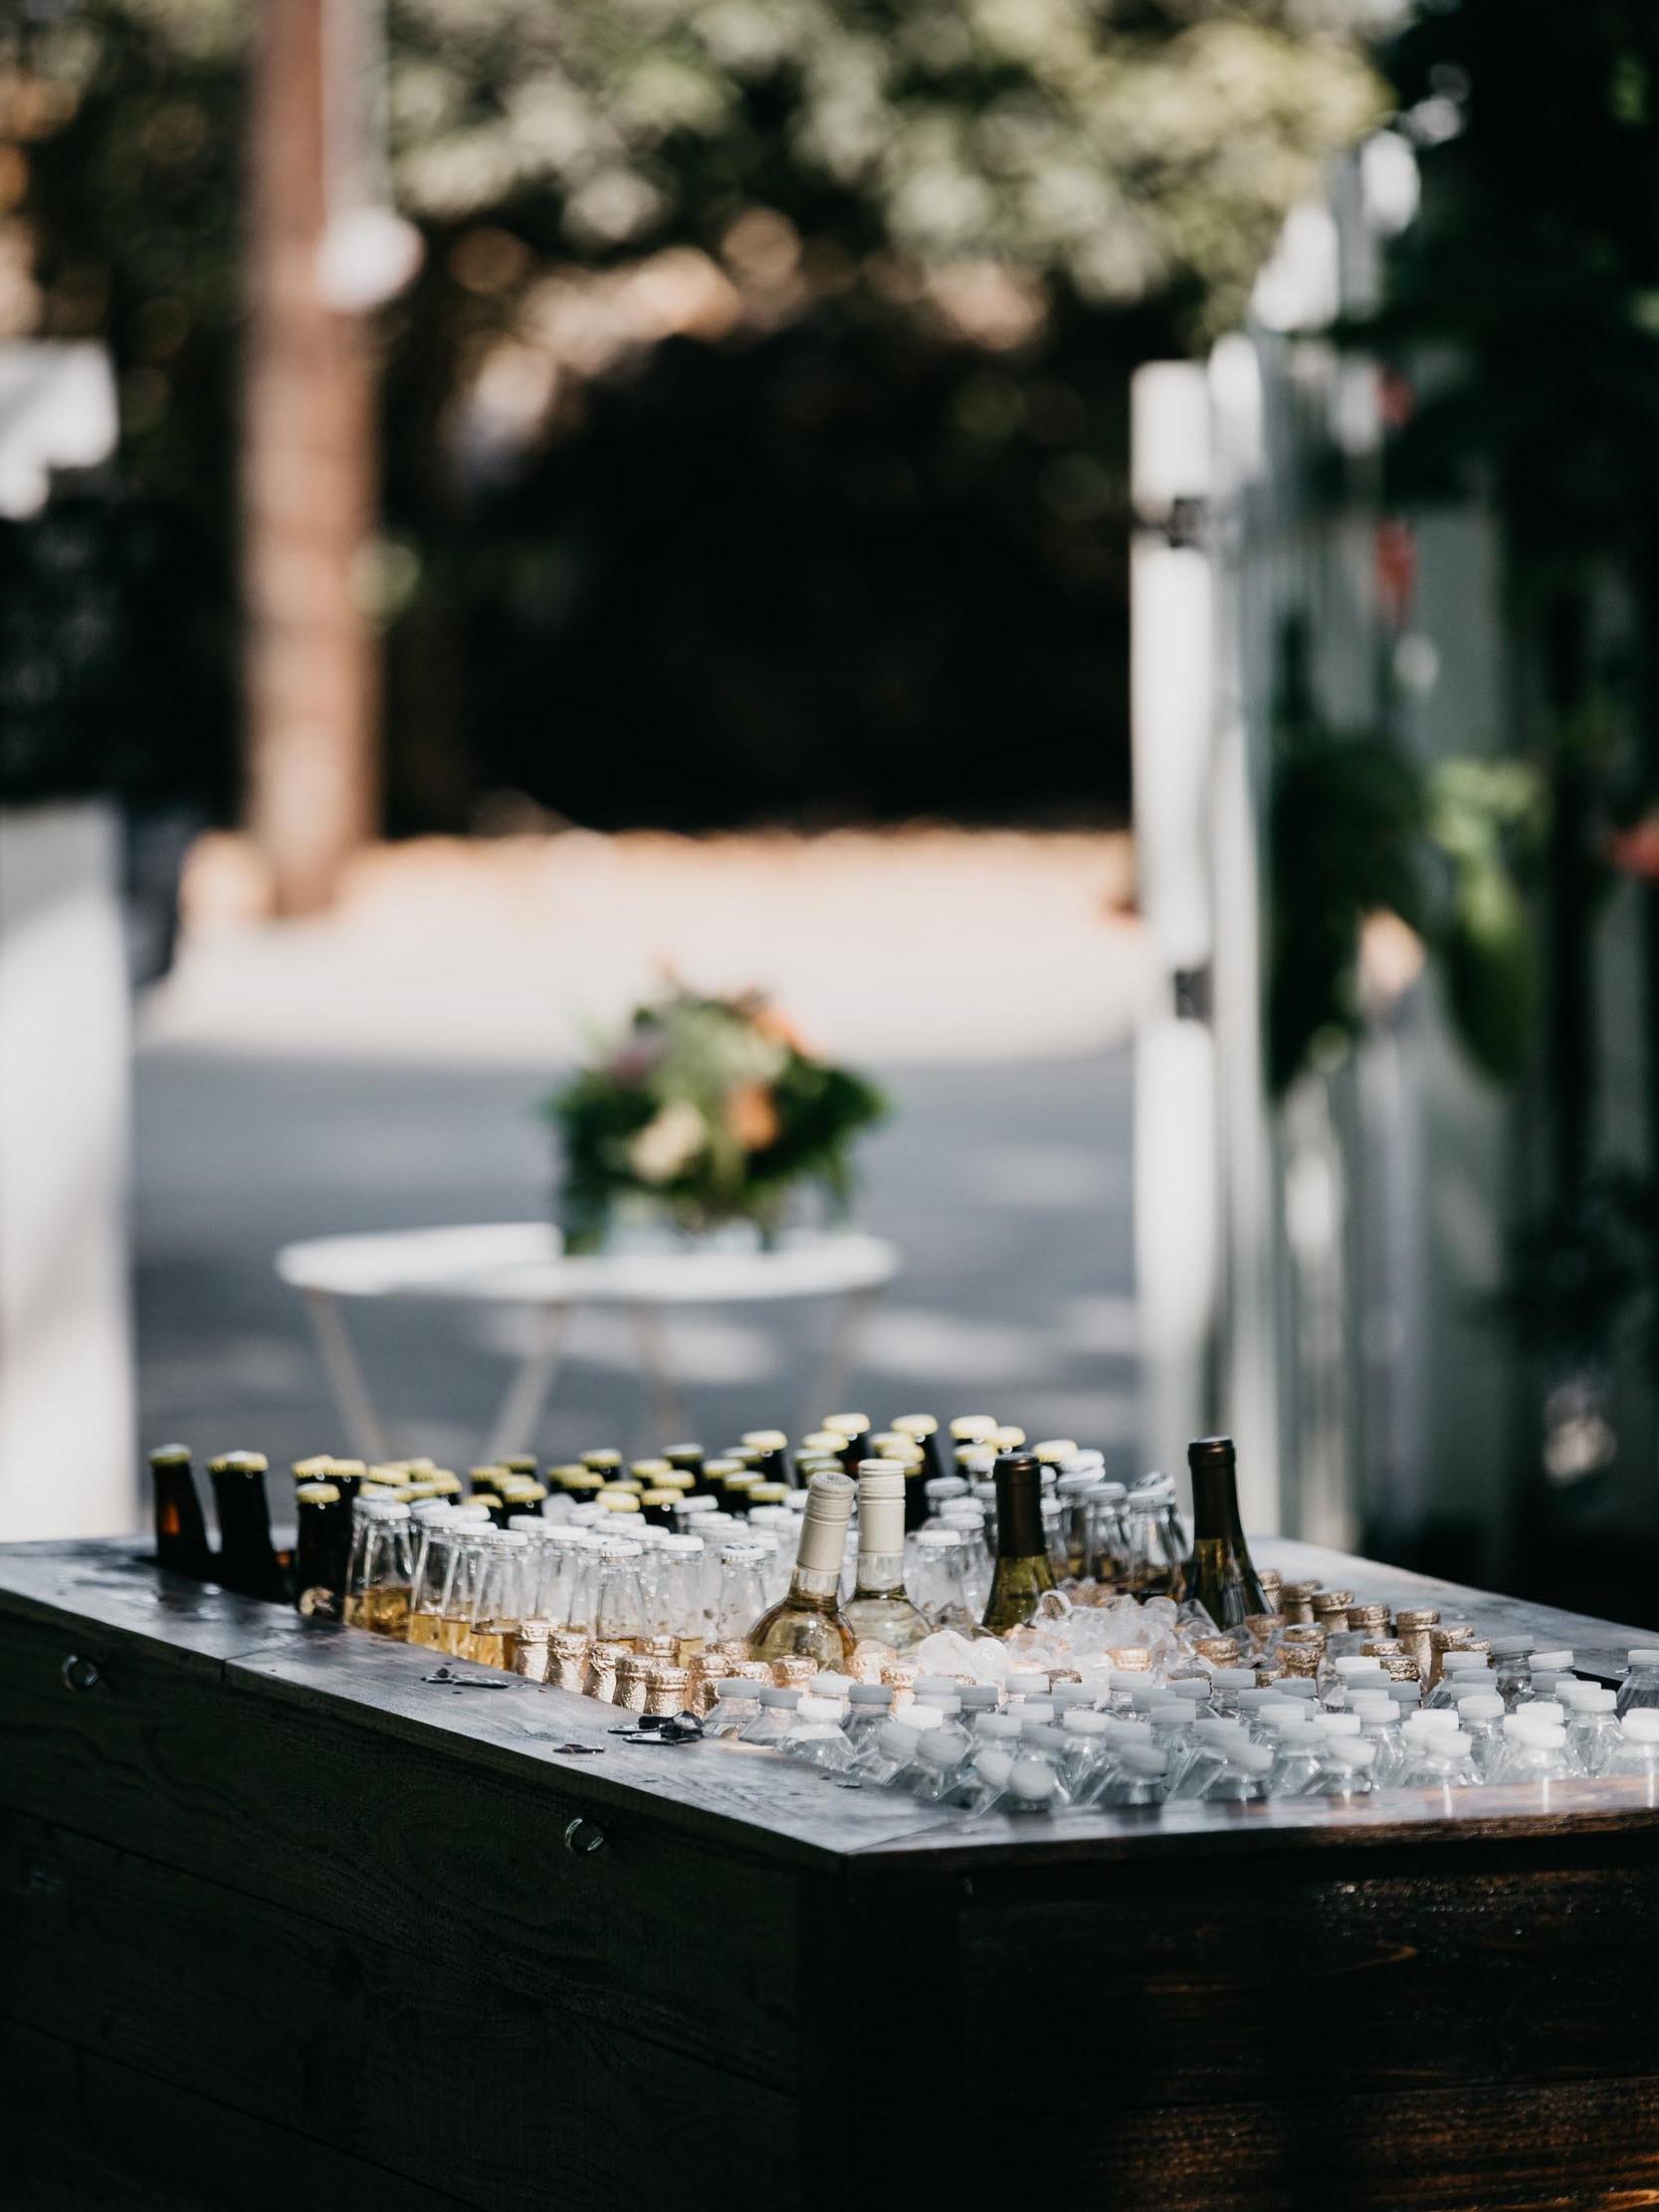 mcgrath-ranch-garden-wedding-venue-geoff-lyndsi-photography-048.jpg